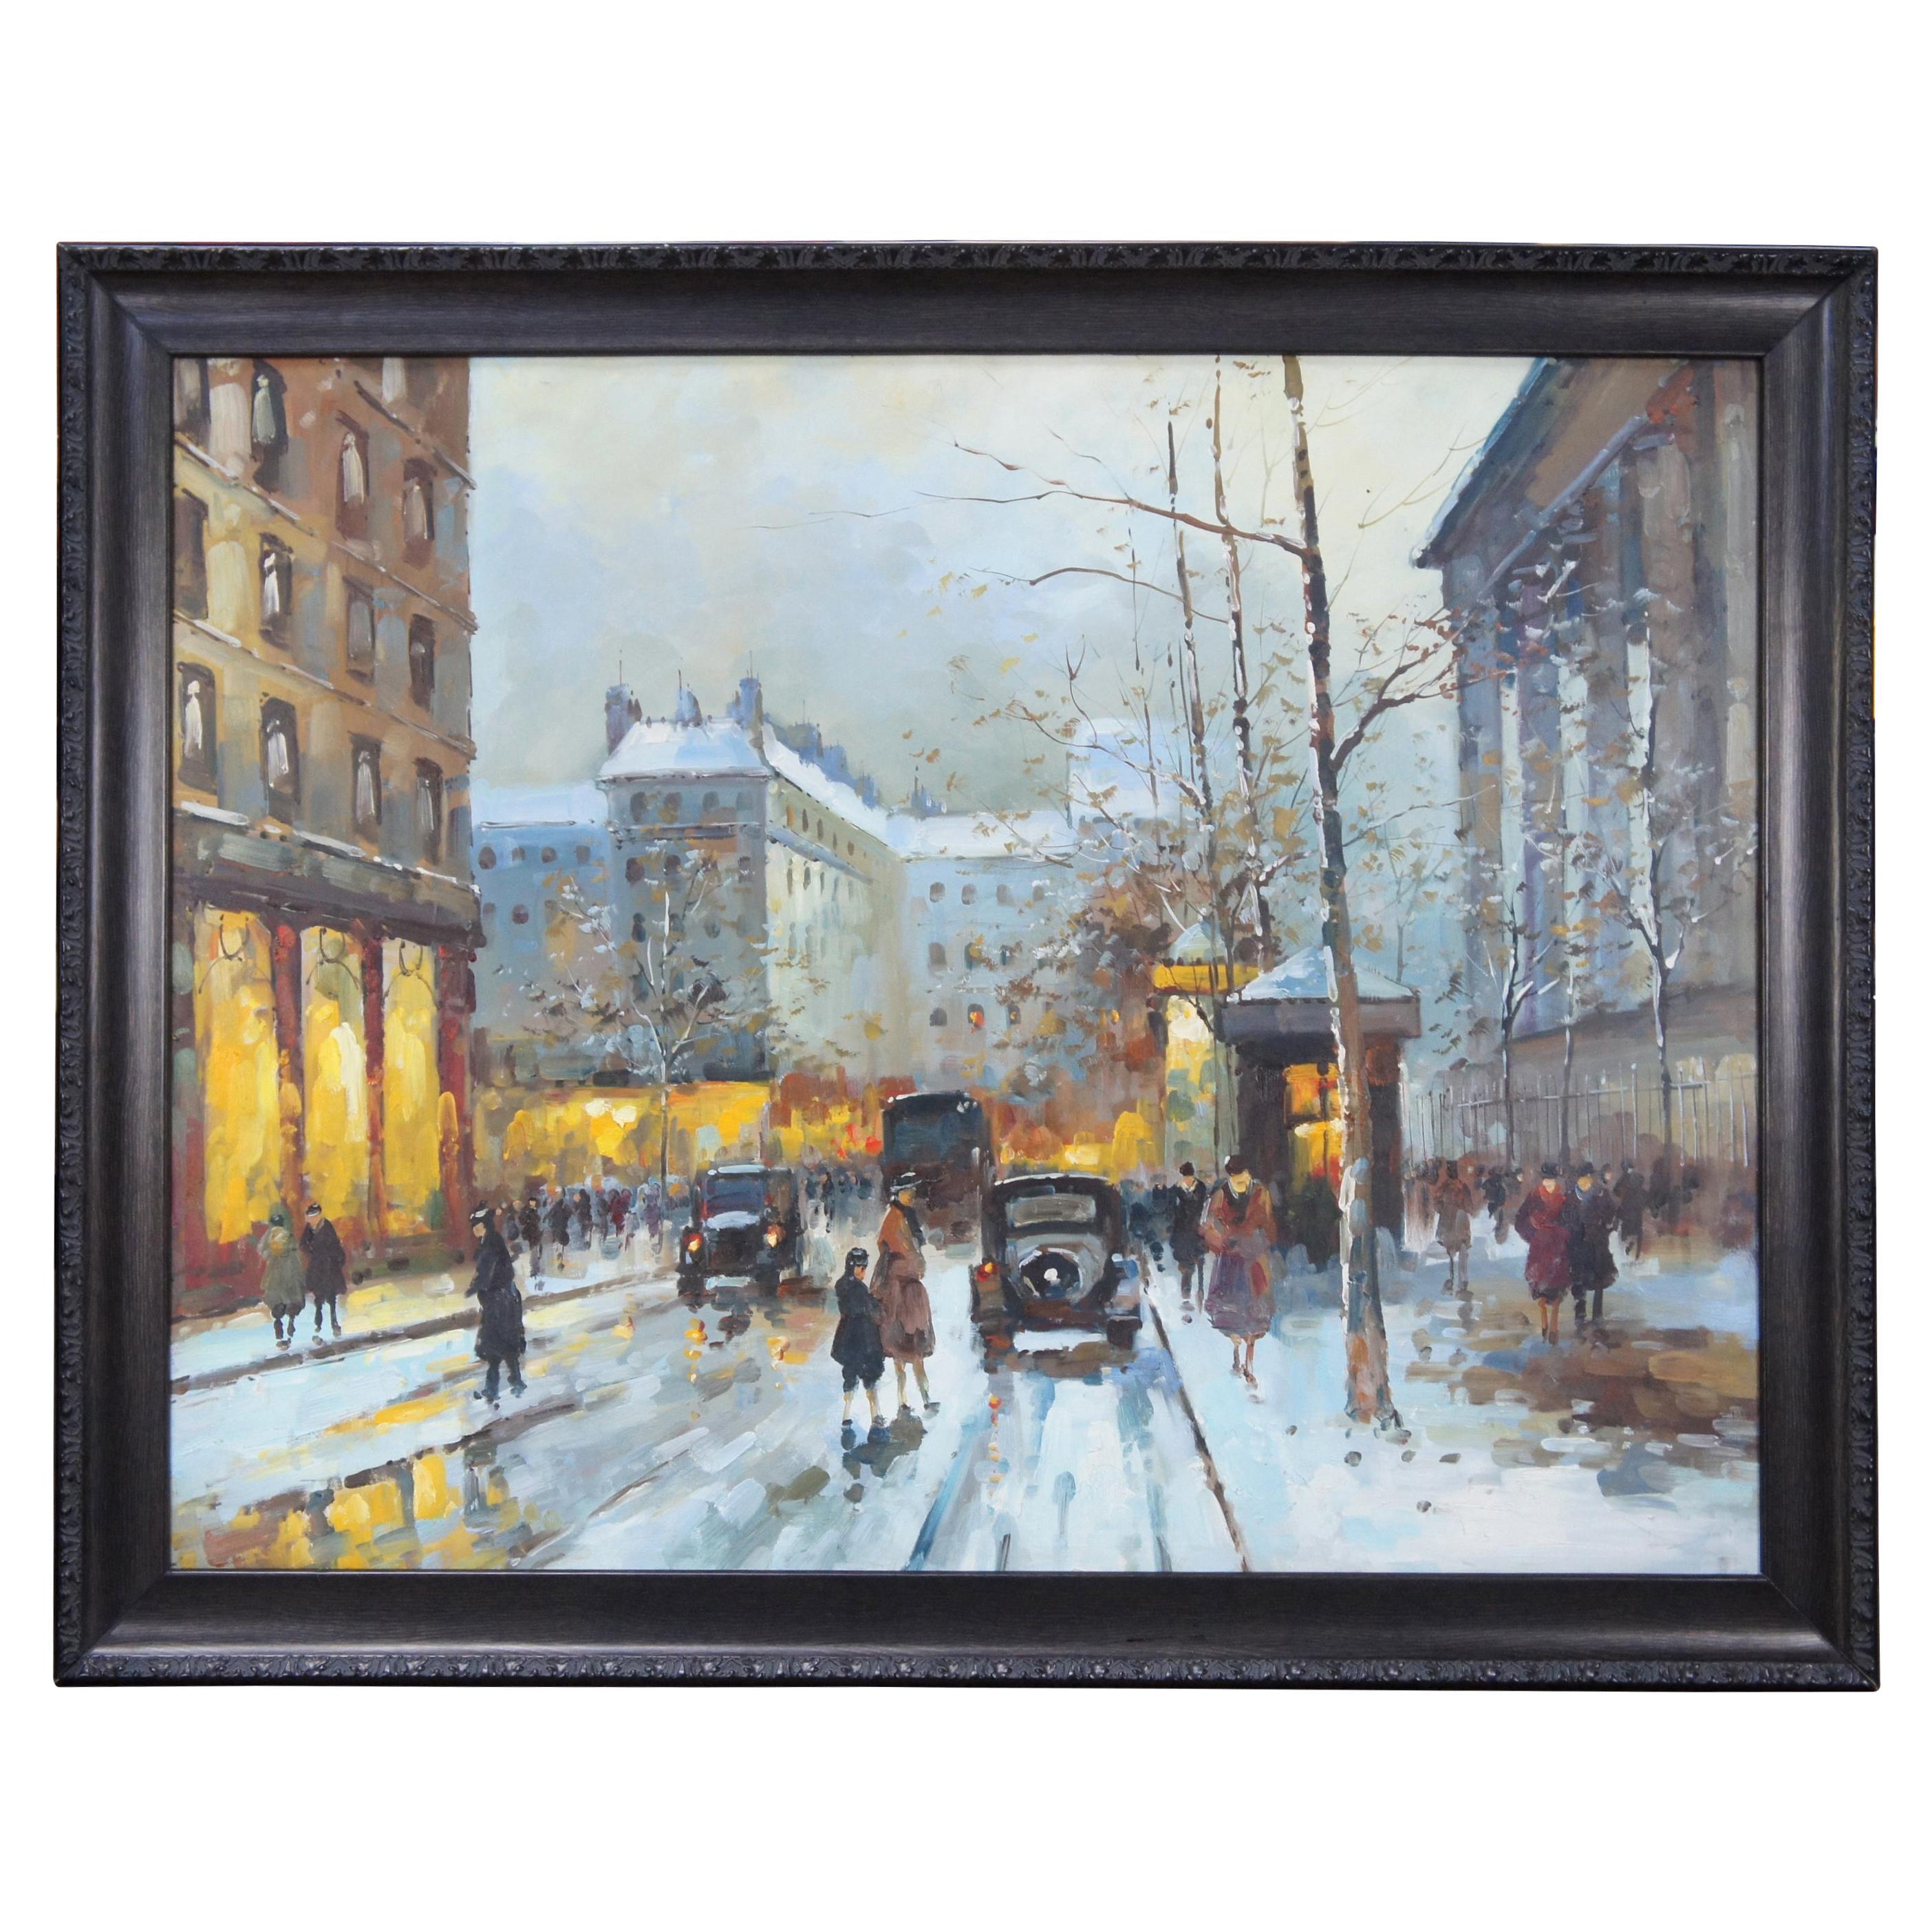 Impressionist Winter Cityscape Paris Street Scene Oil Painting on Canvas